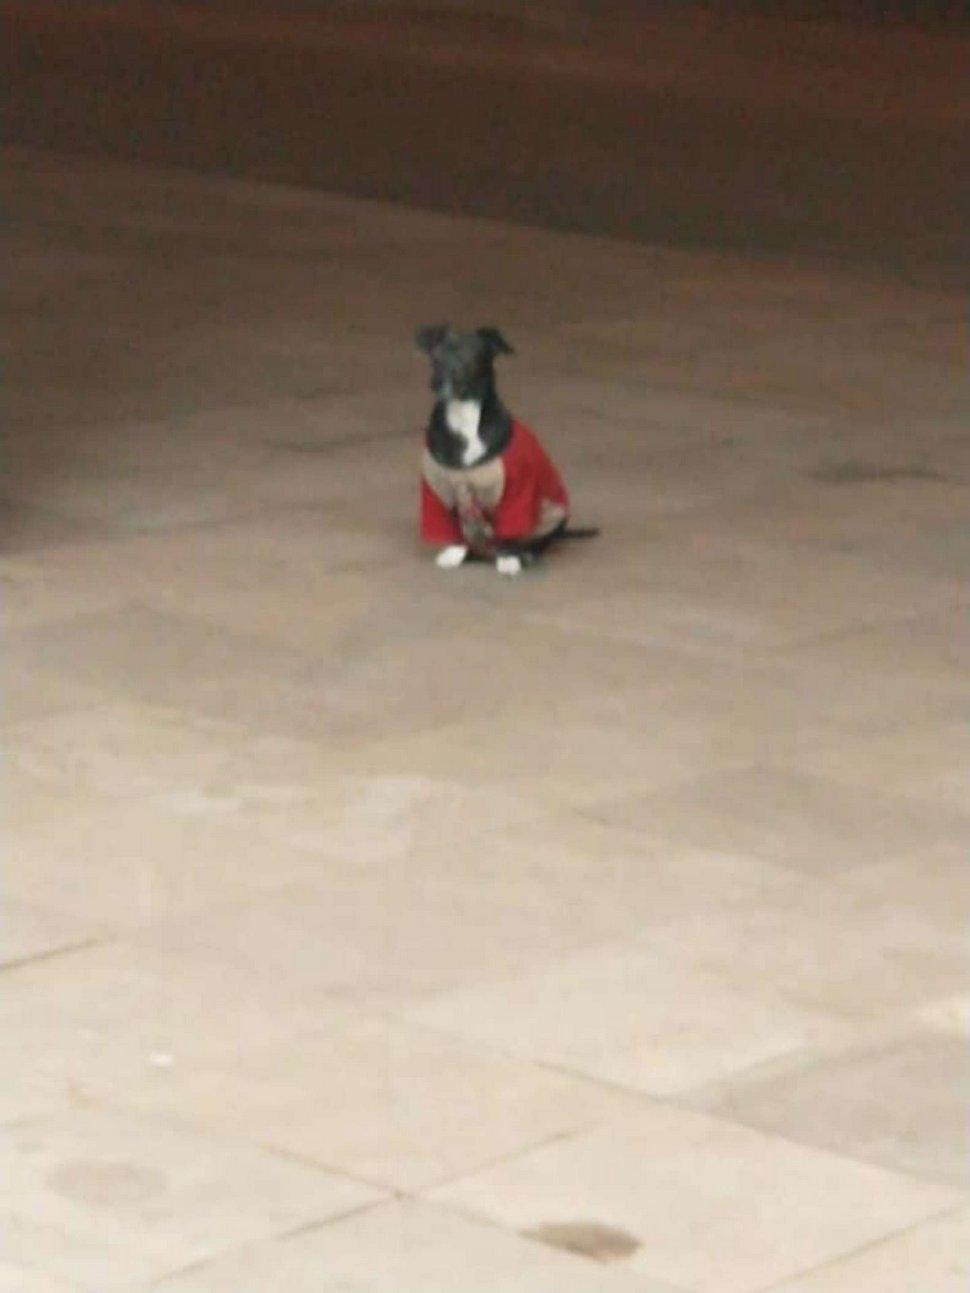 https://www.ipnoze.com/wordpress/wp-content/uploads/2020/10/chien-ambulance-suit-maitre-hopital-anderson-bahi-005.jpg